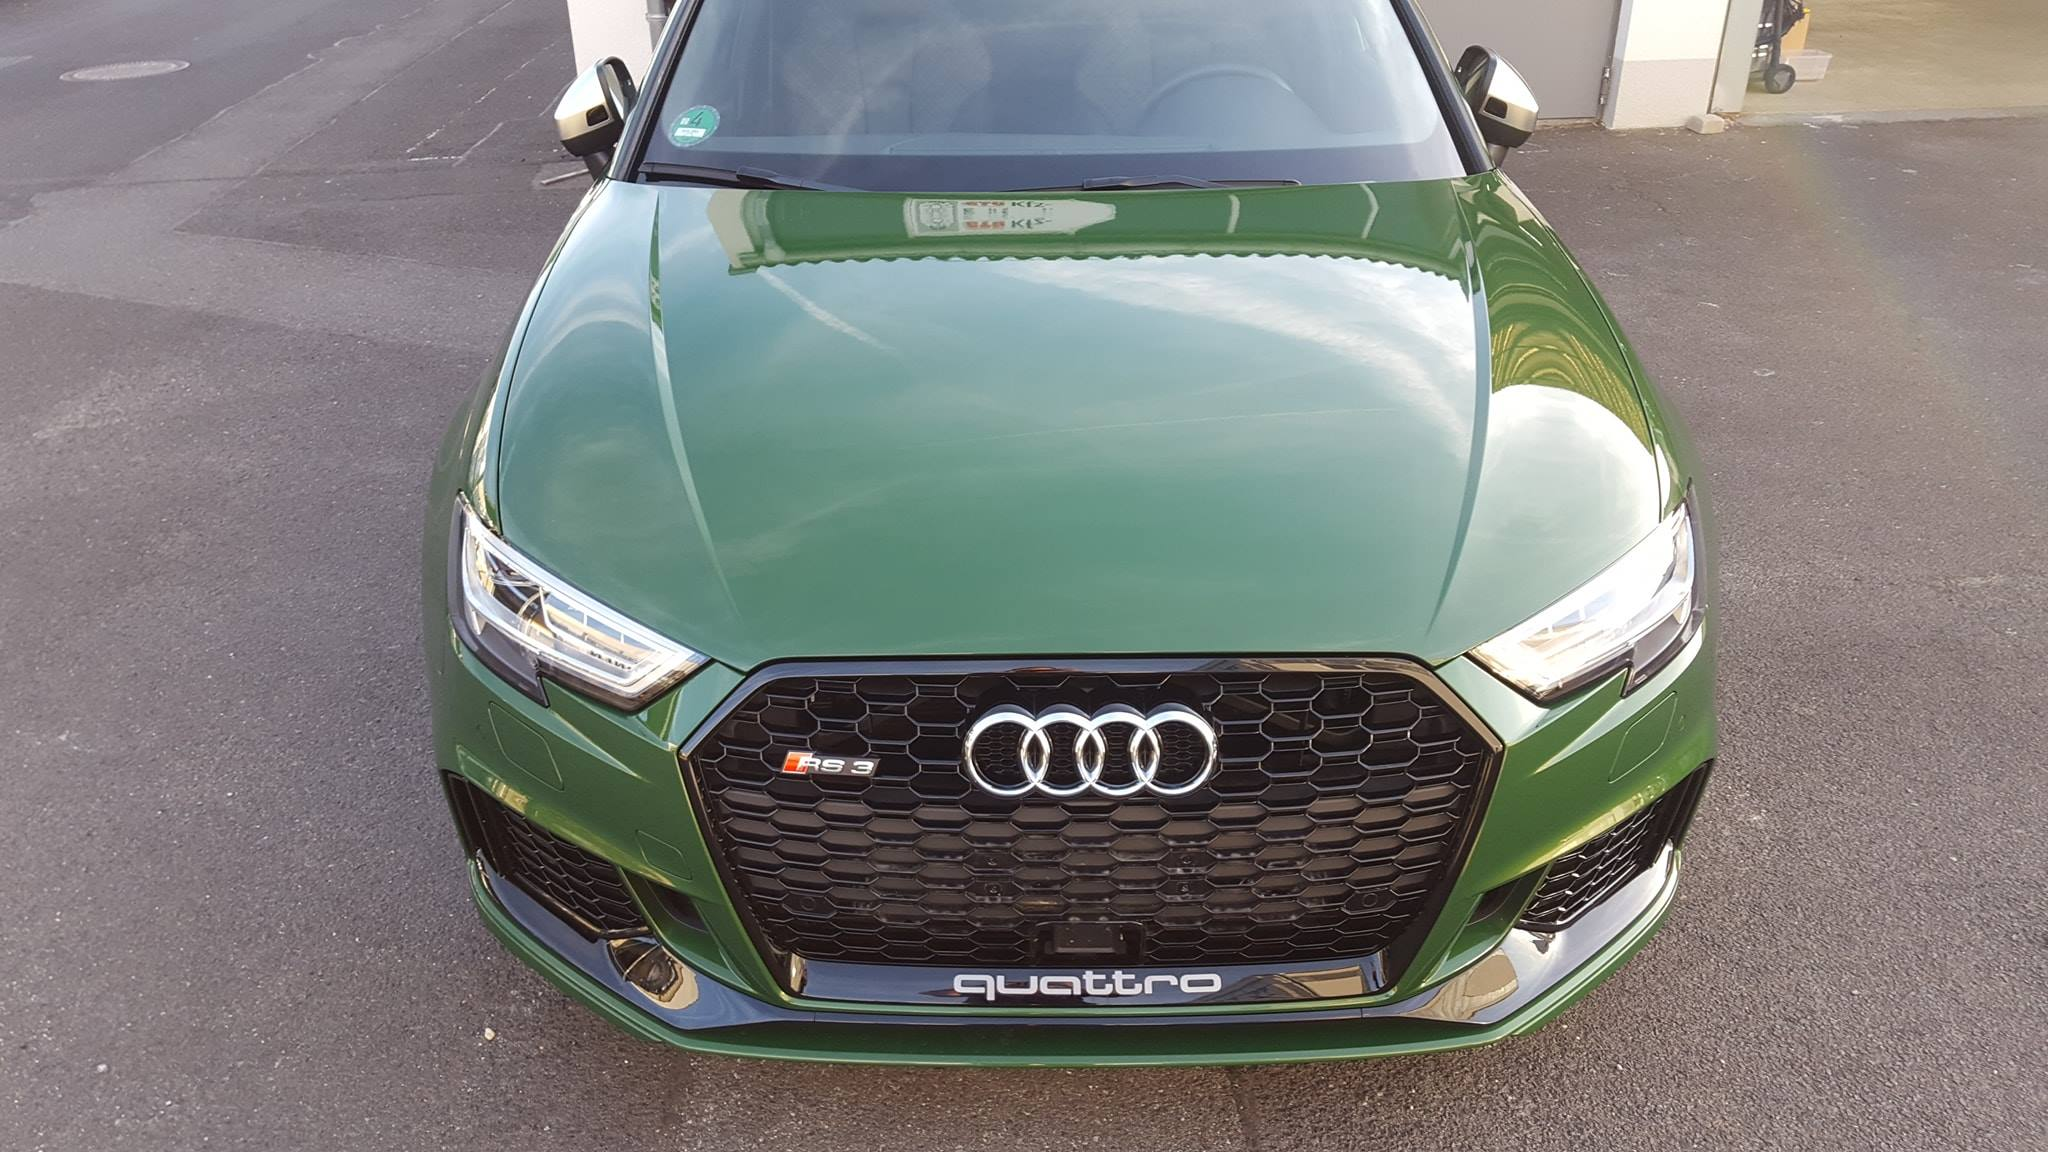 folierung würzburg Audi RS3 XPEL Lackschutzfolie